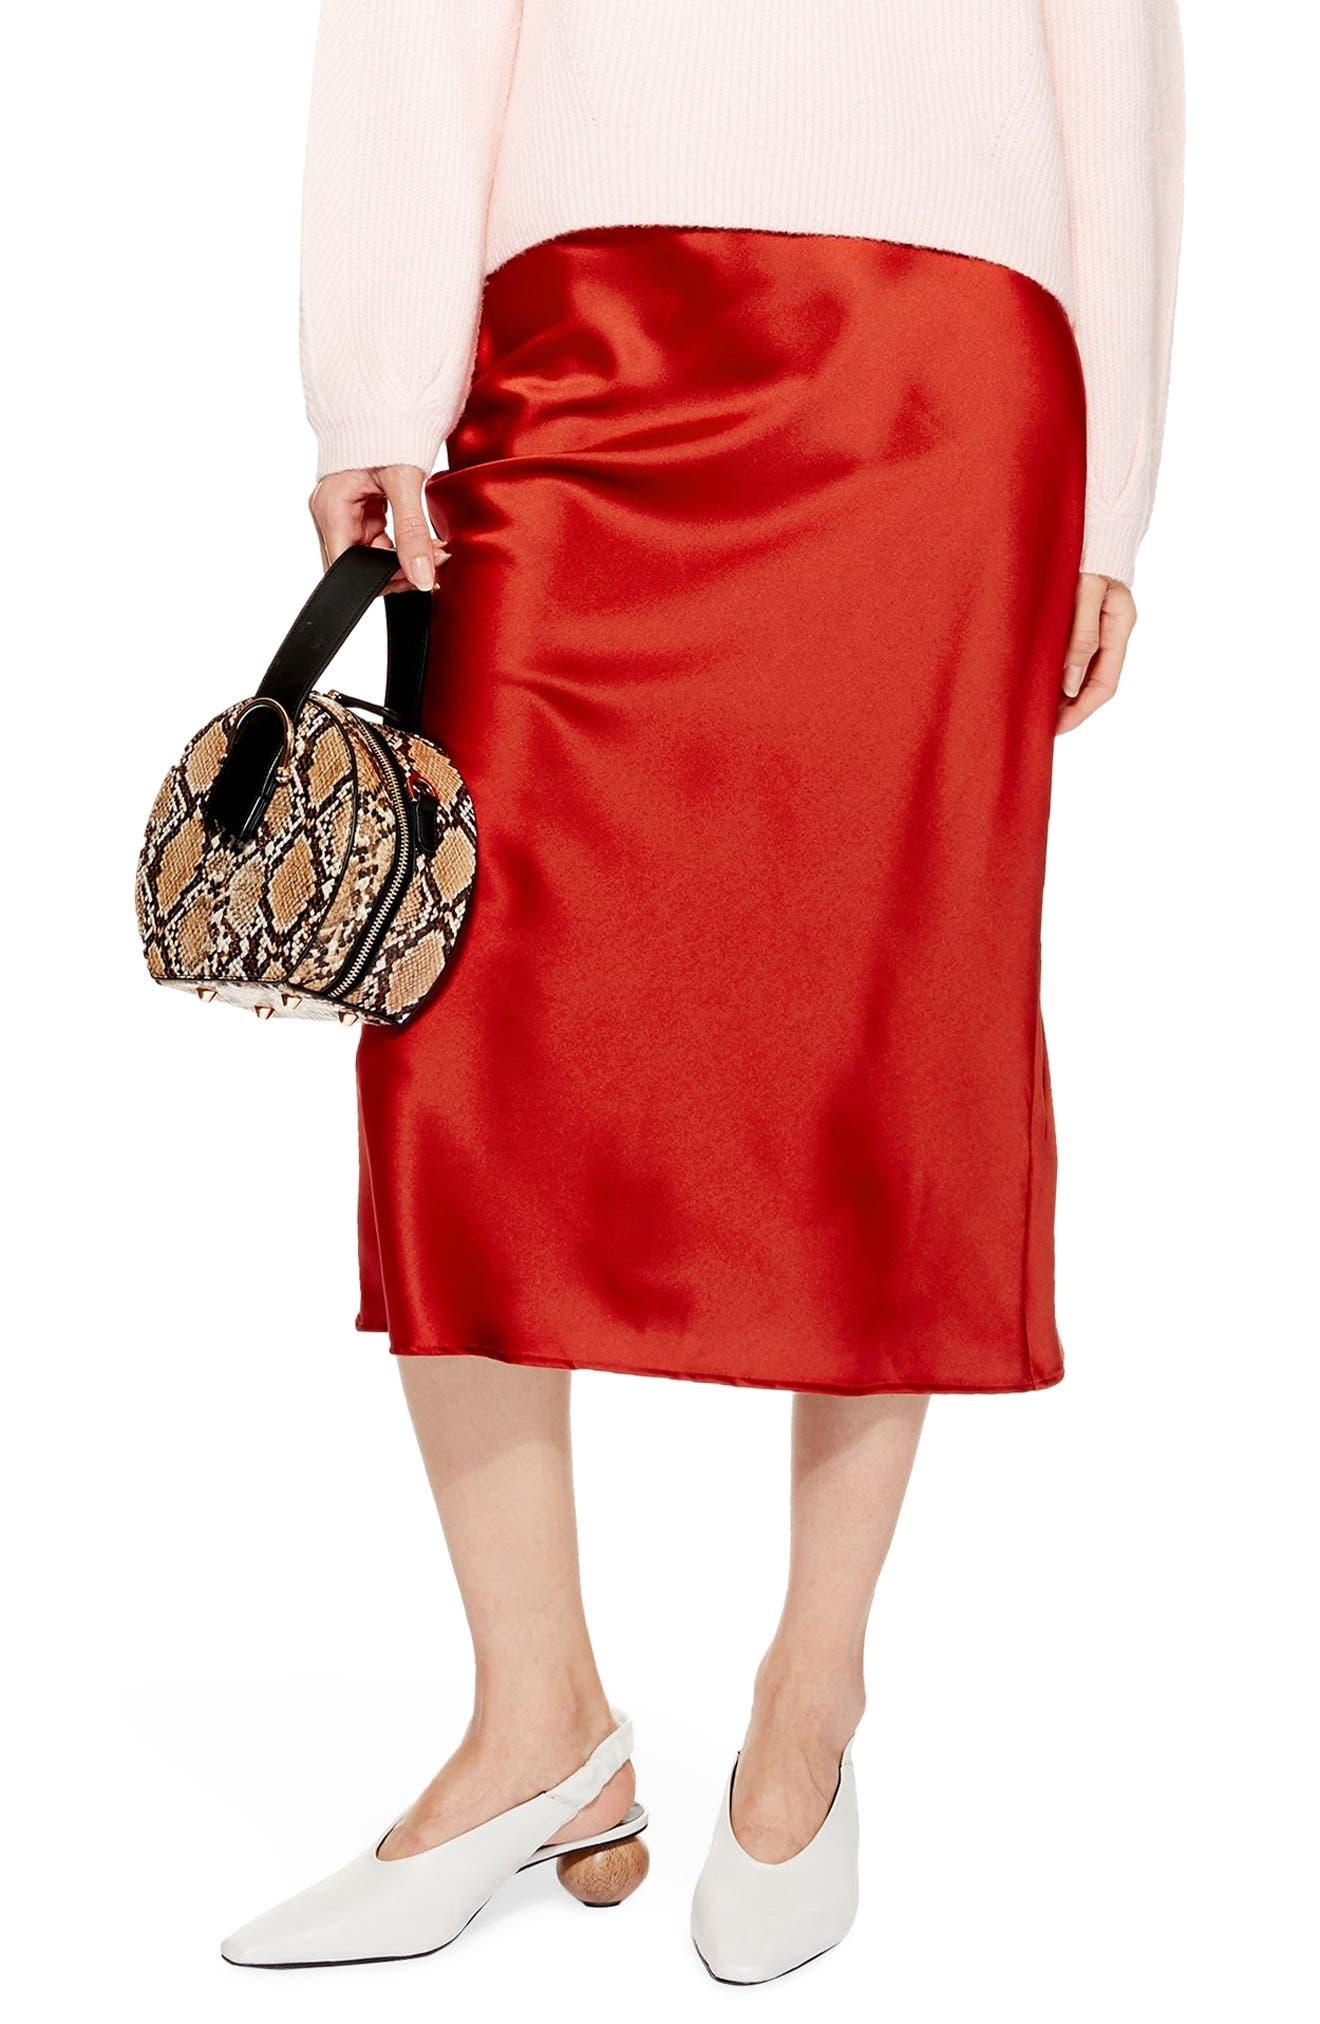 Petite Topshop Satin Midi Skirt, P US (fits like 0-2P) - Red